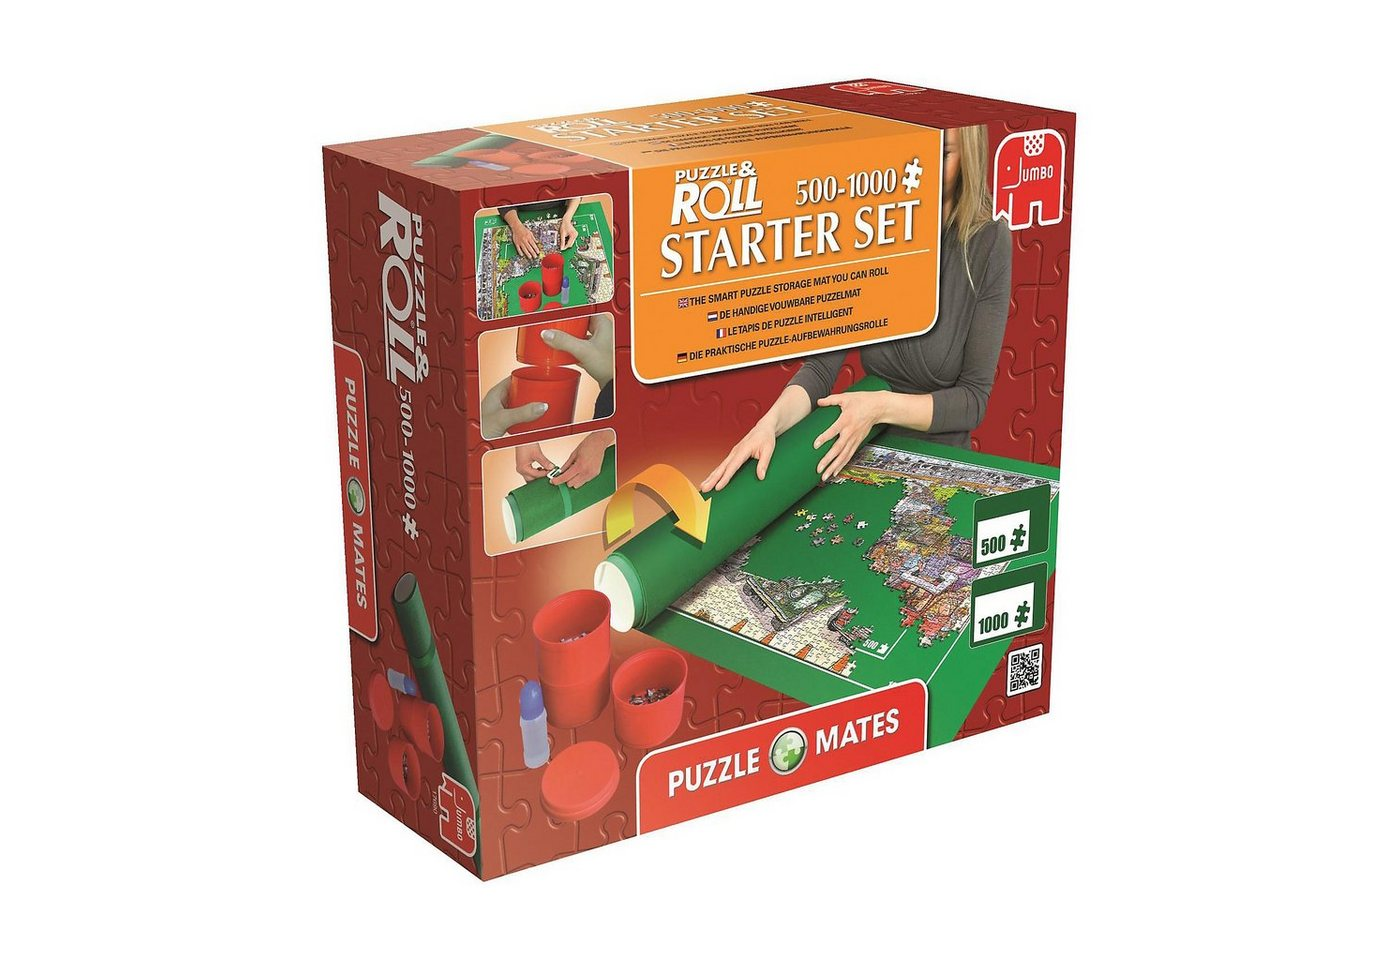 Jumbo Puzzle Mates - Puzzle & Roll Starter Set 500-1000 Teile